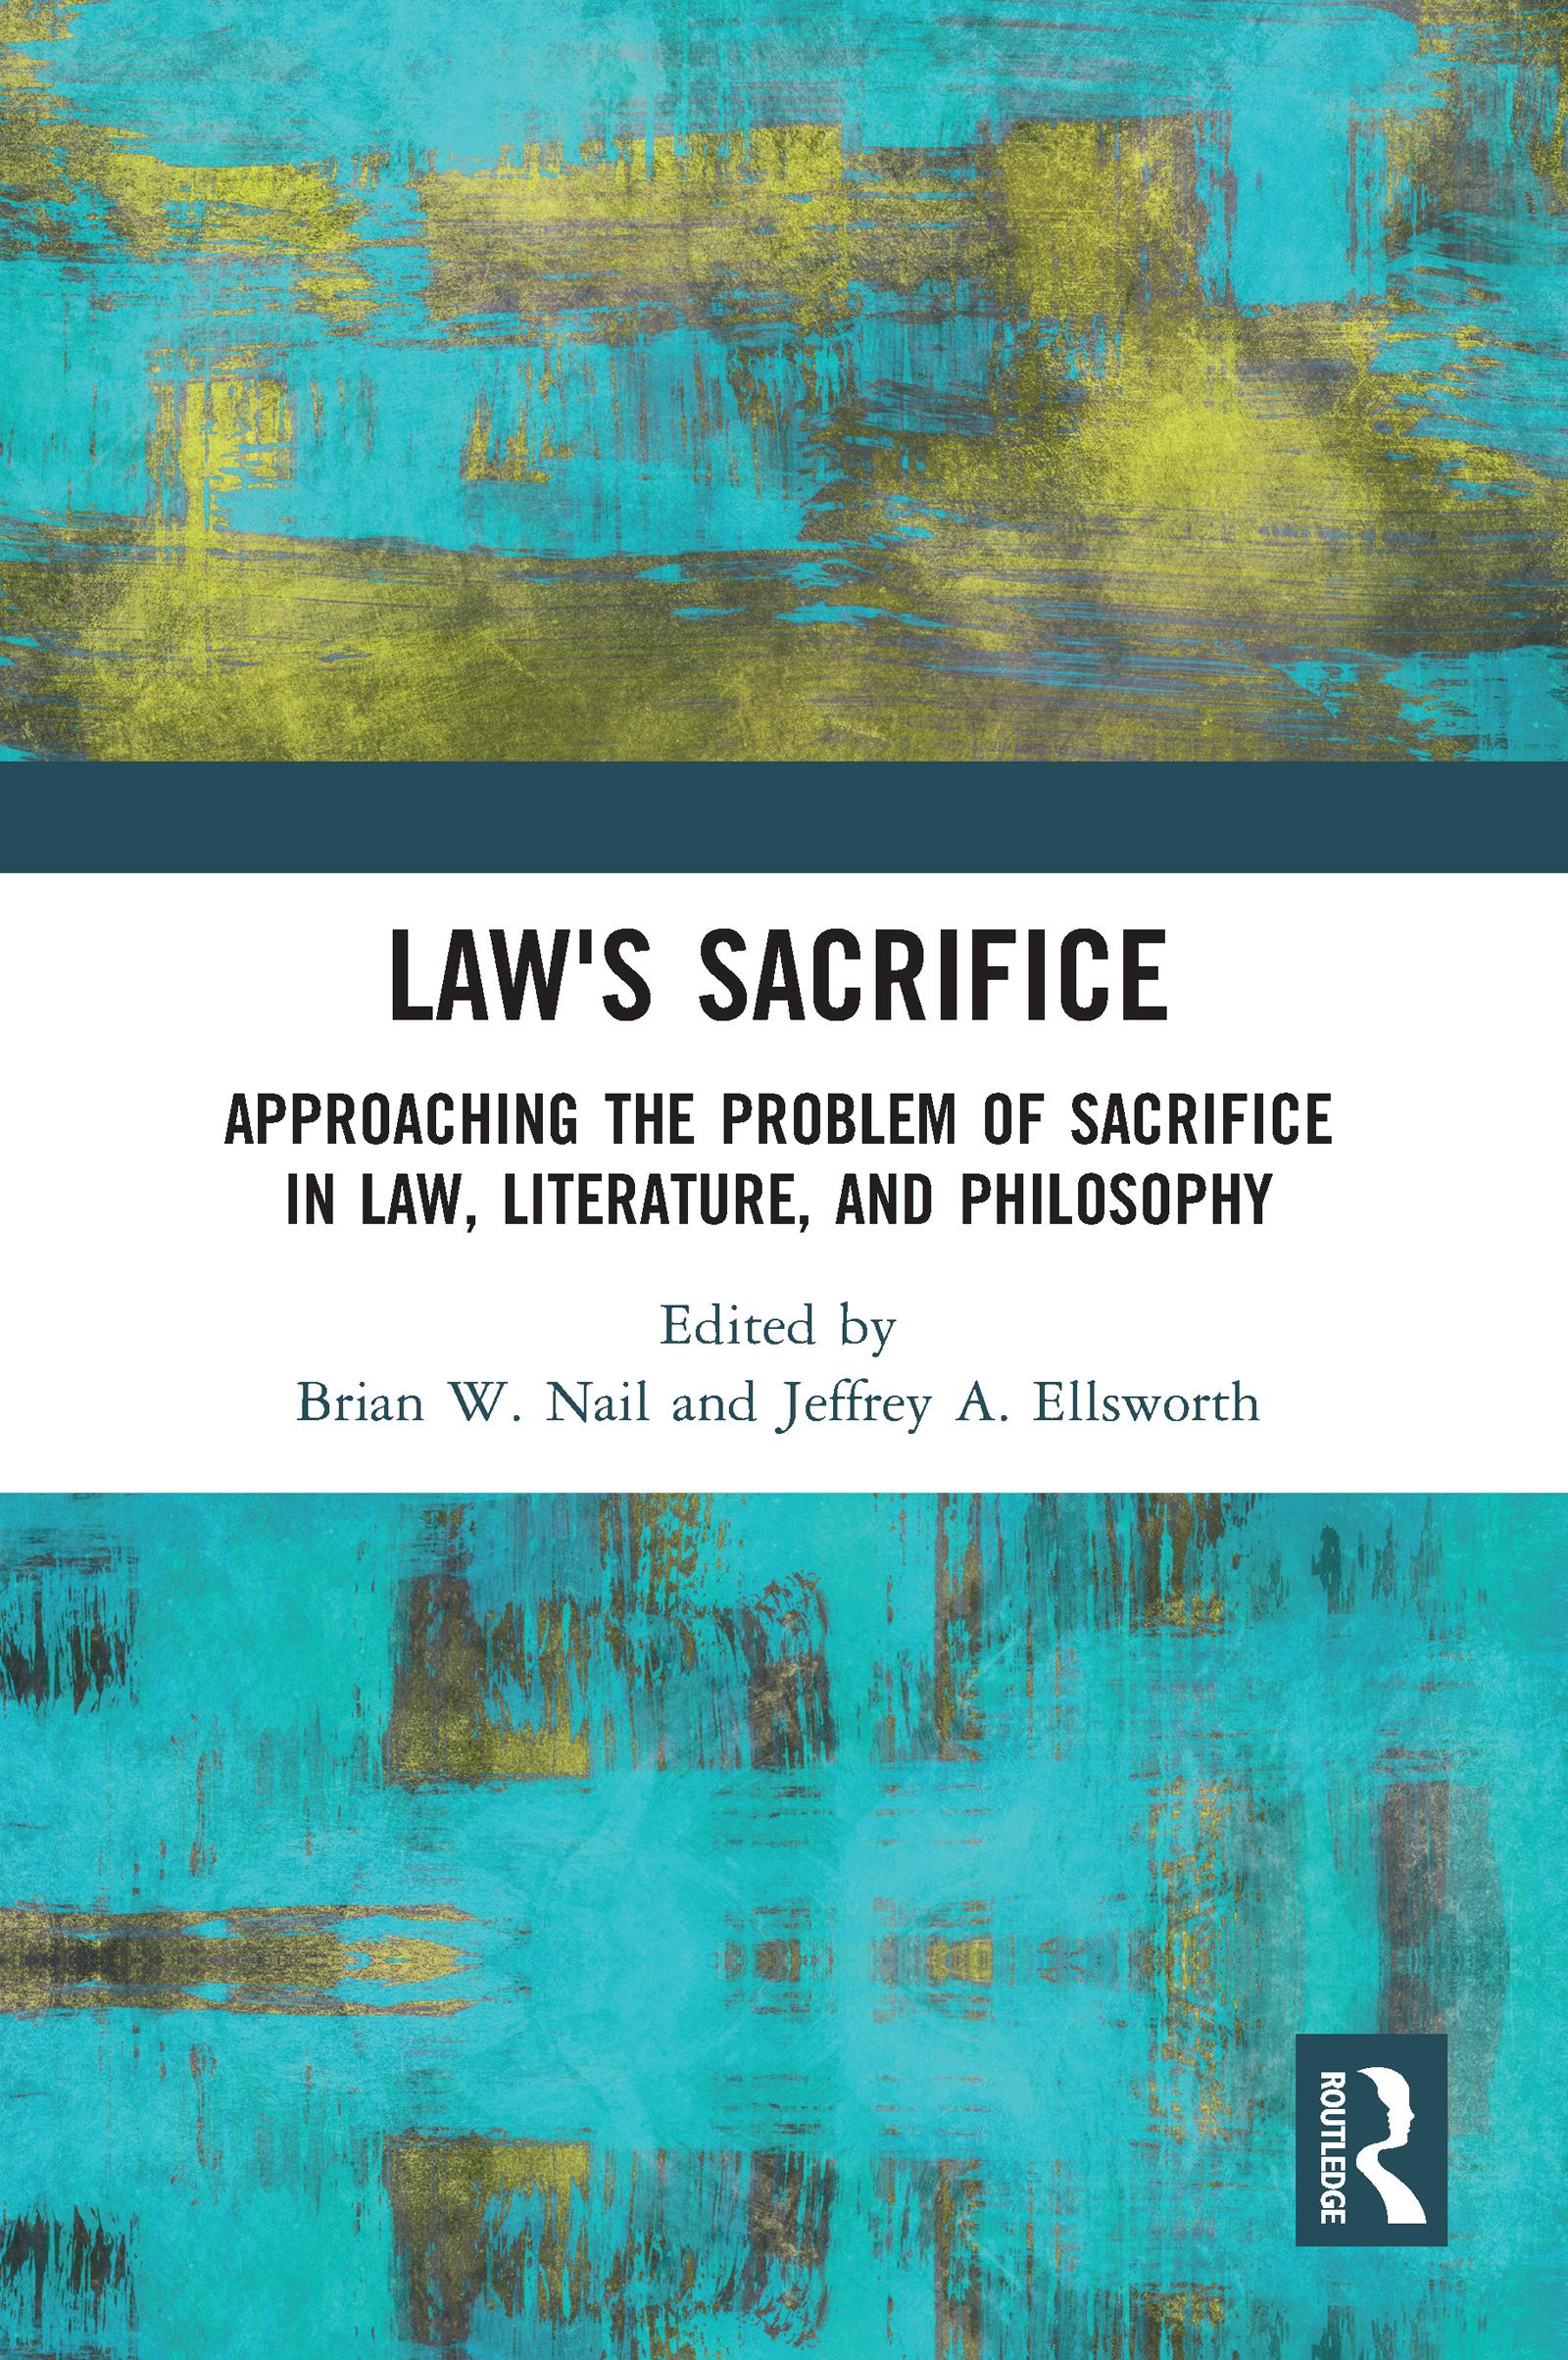 Law's Sacrifice